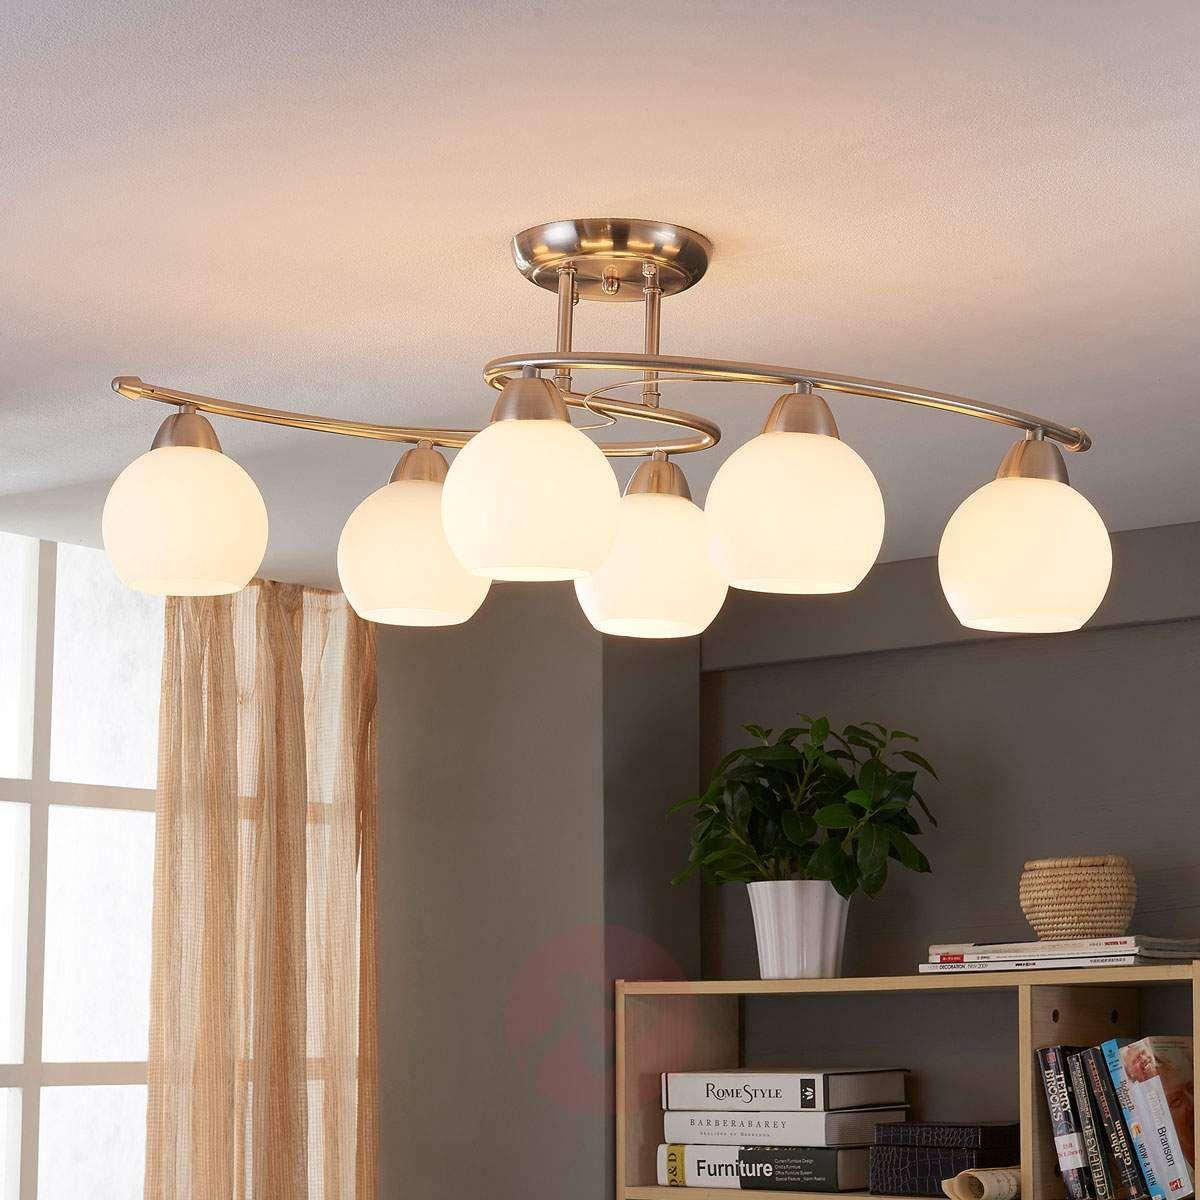 Lampa Sufitowa Do Jadalni Svean 6 Punktowa Lampy Sufitowe